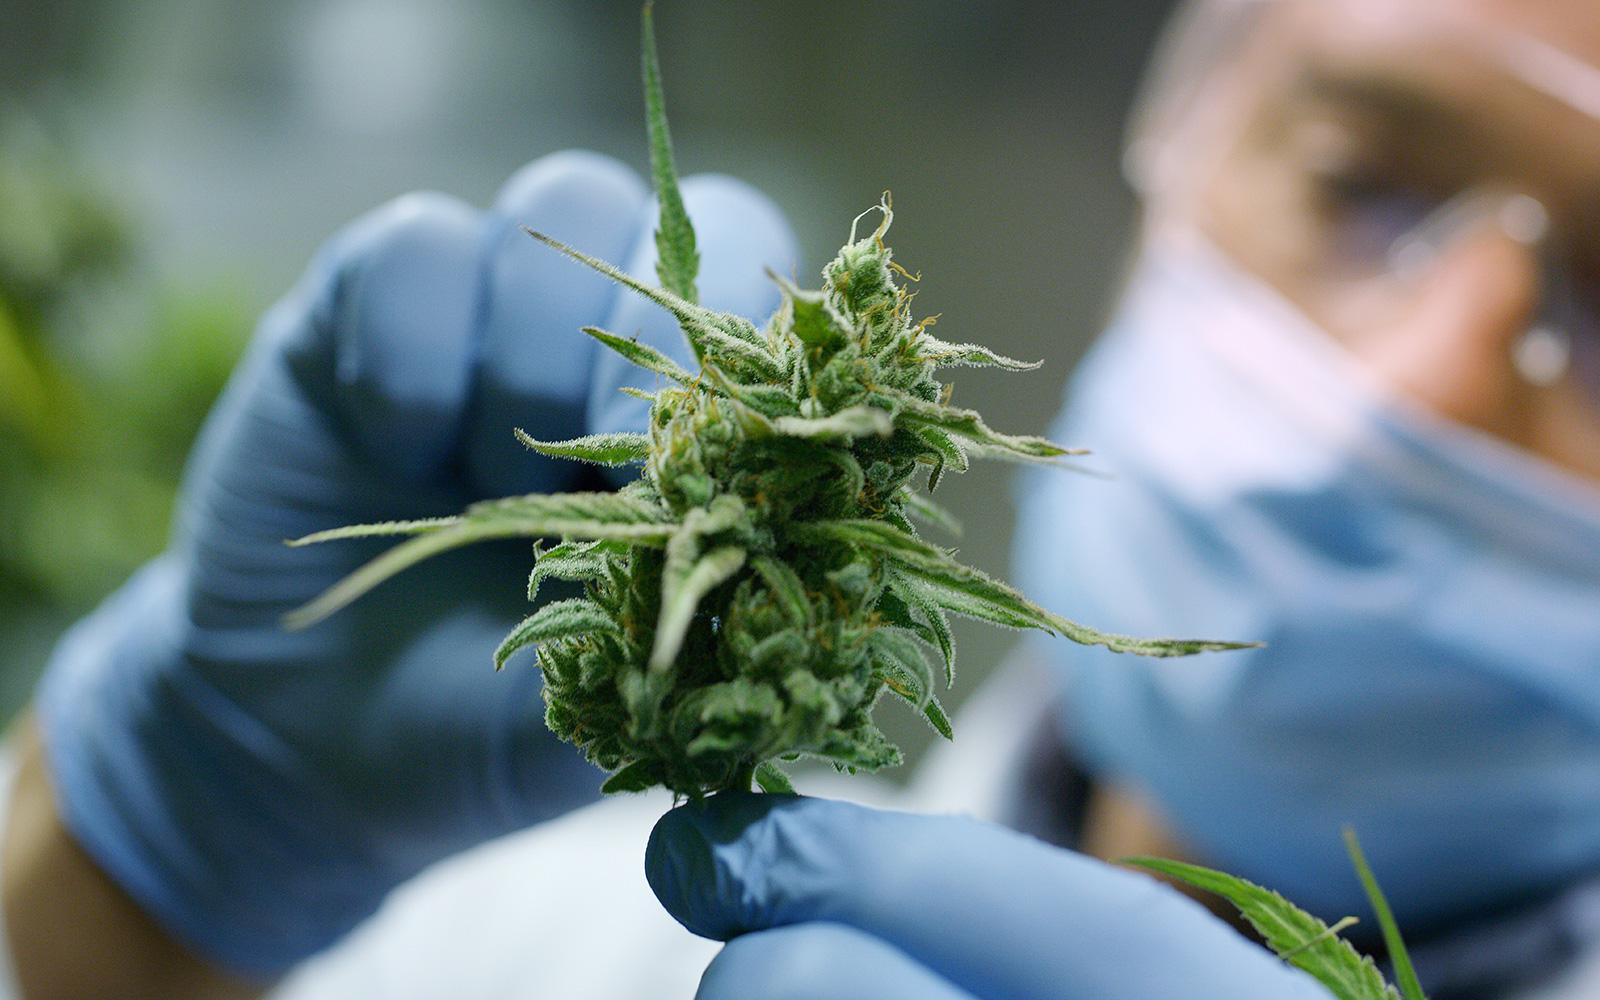 Brains Bioceutical Corp. & Cronos Australia Enter into Strategic Partnership to Supply Medicinal Cannabinoid Products